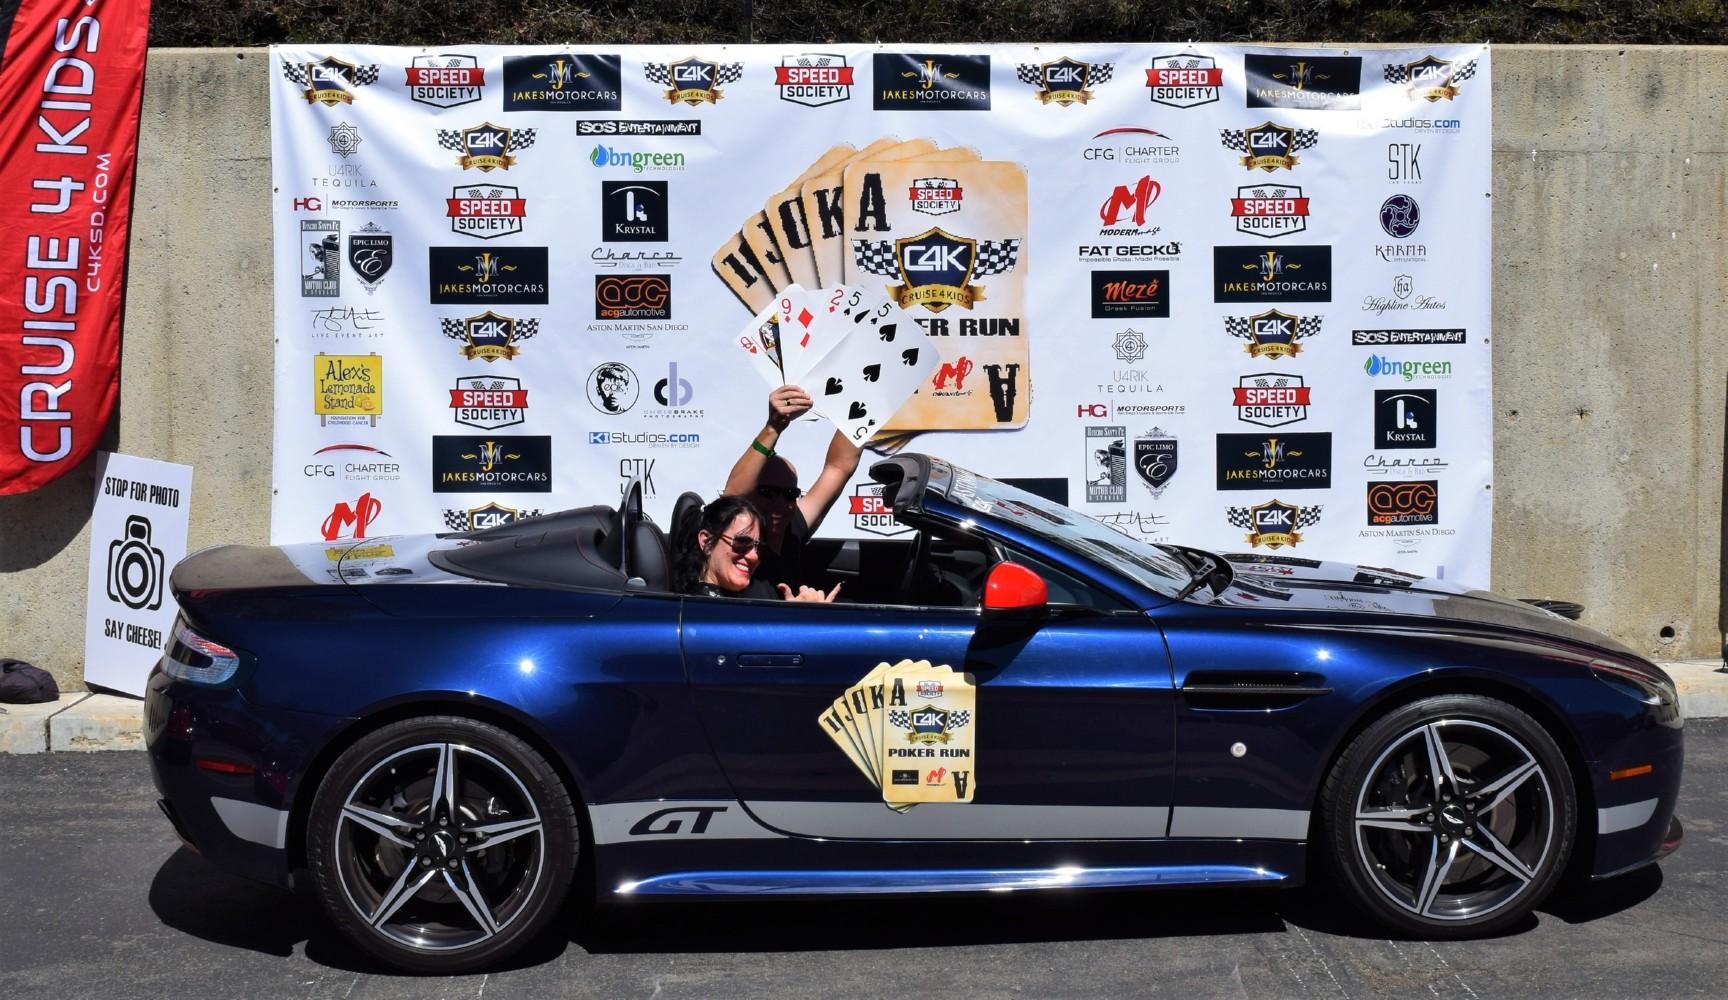 Poker Run 2017 Banner Photos - 36.jpg